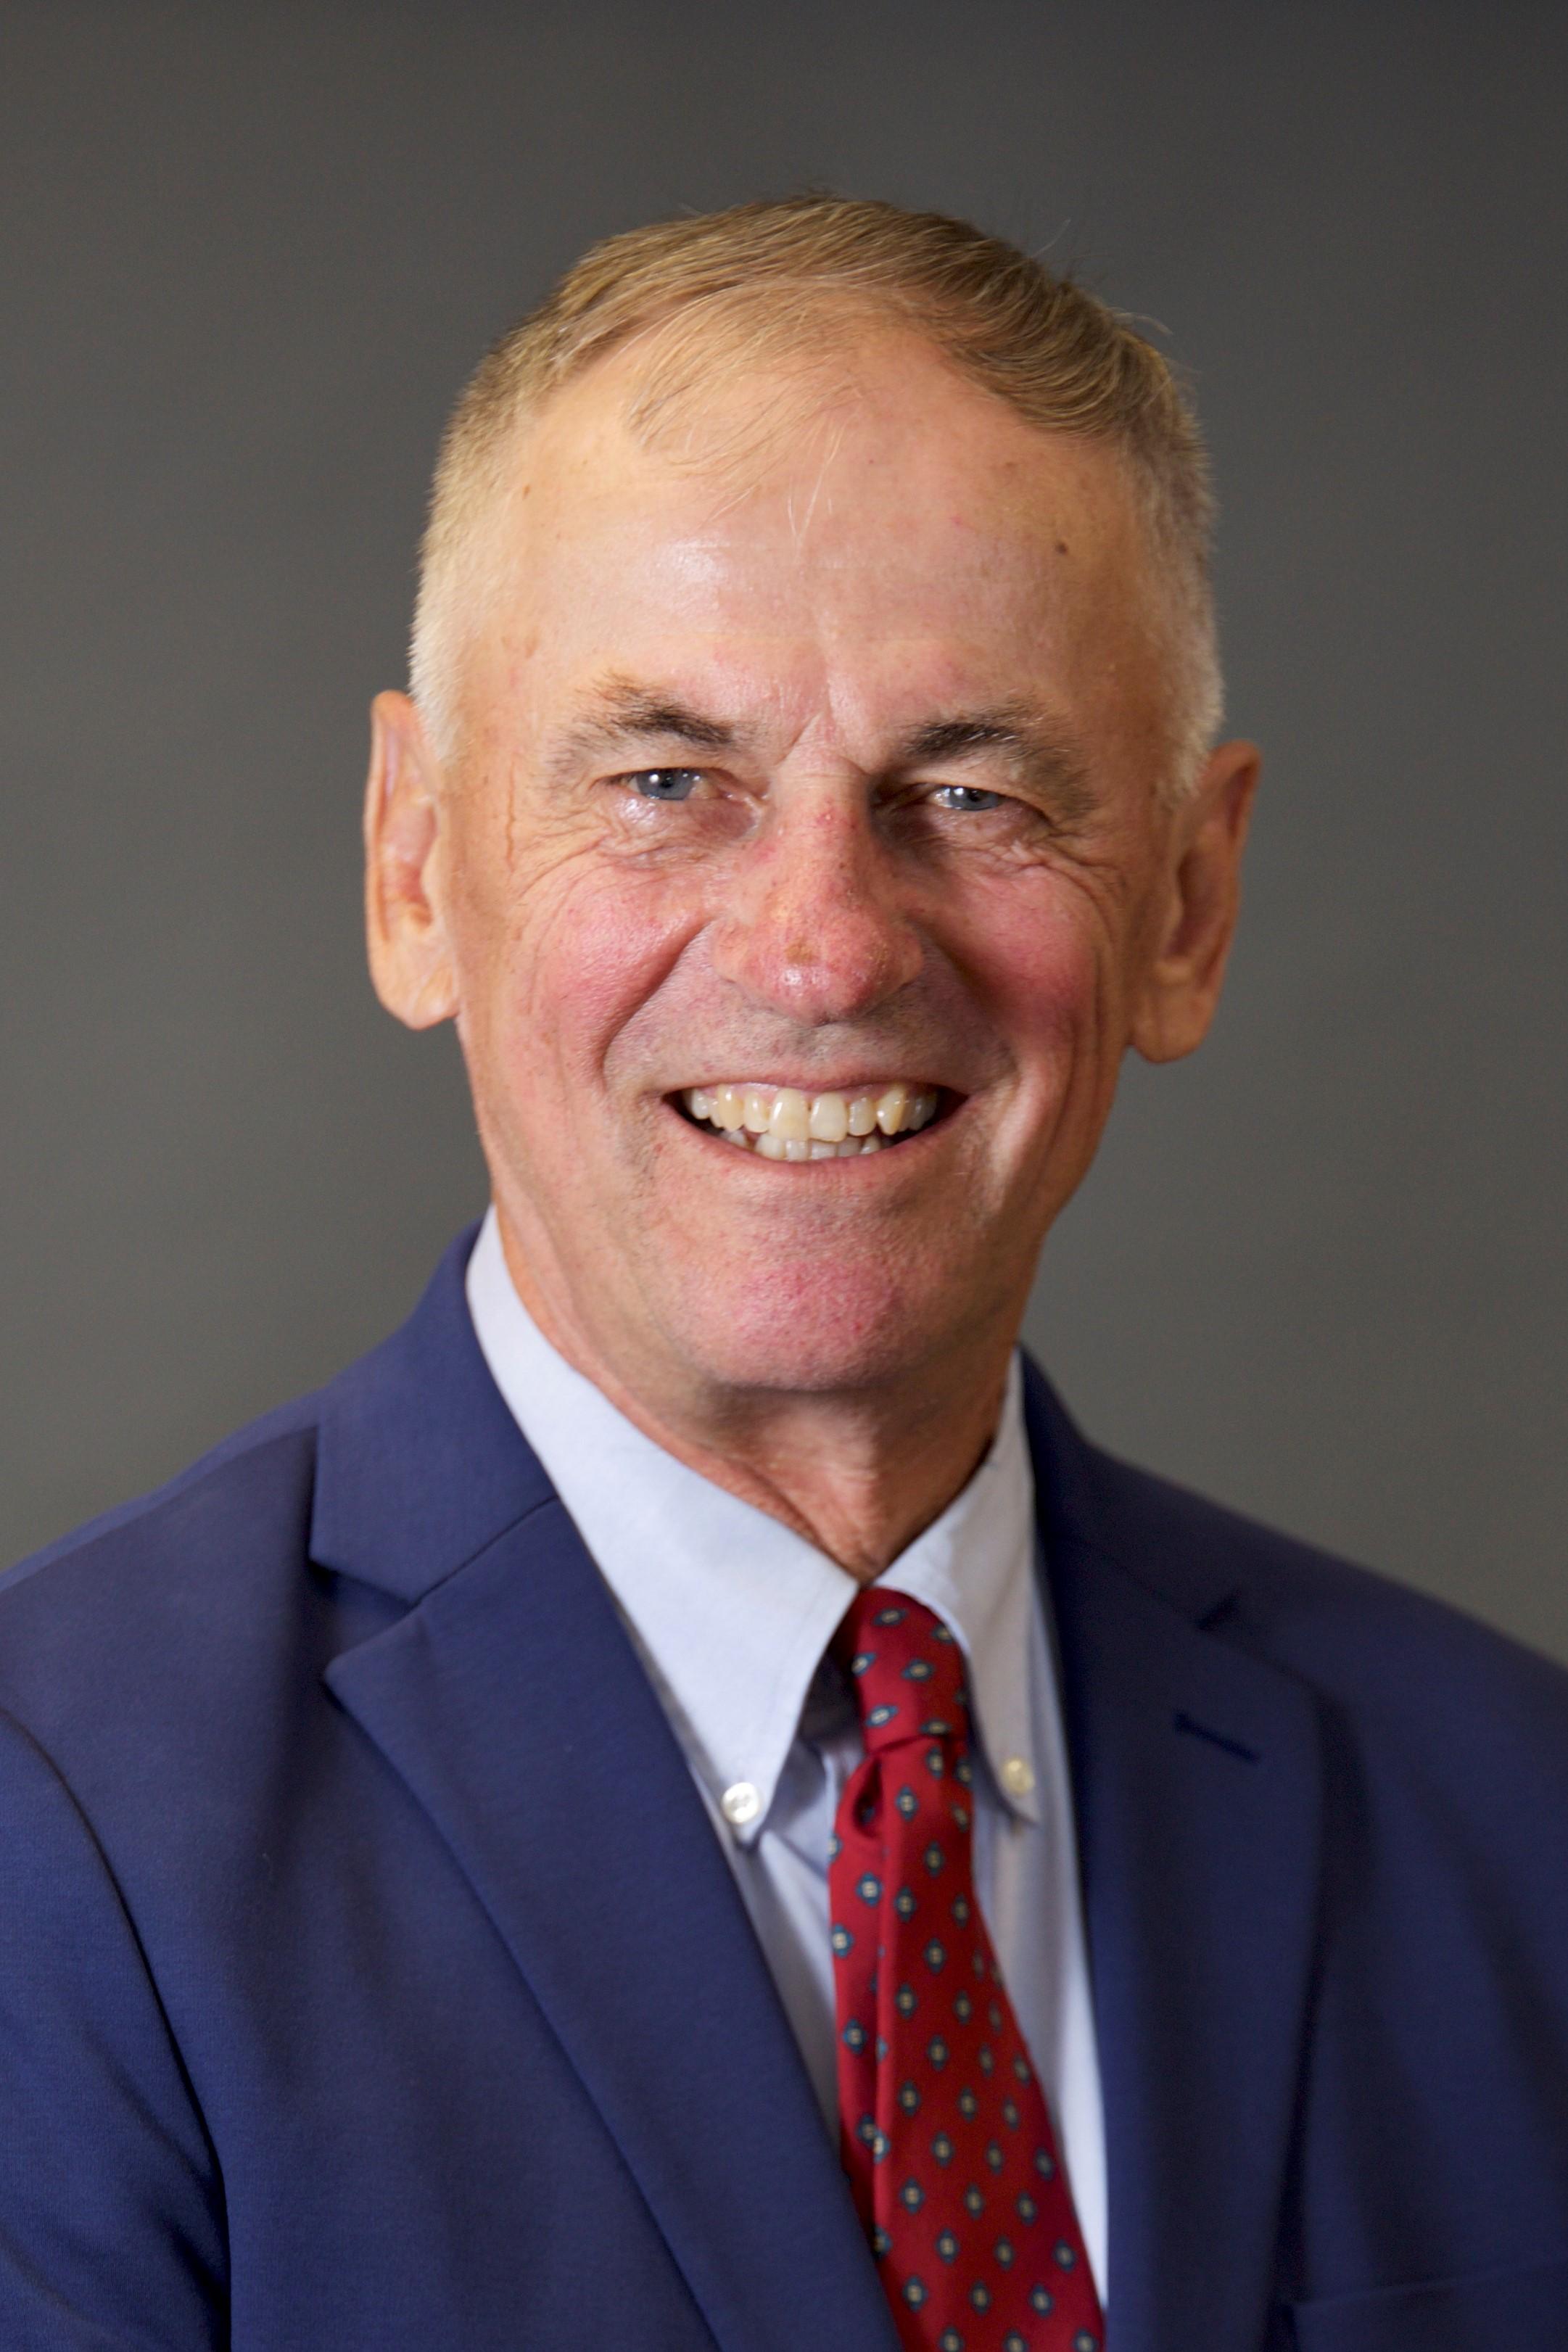 Donald E. Crispell - Headshot